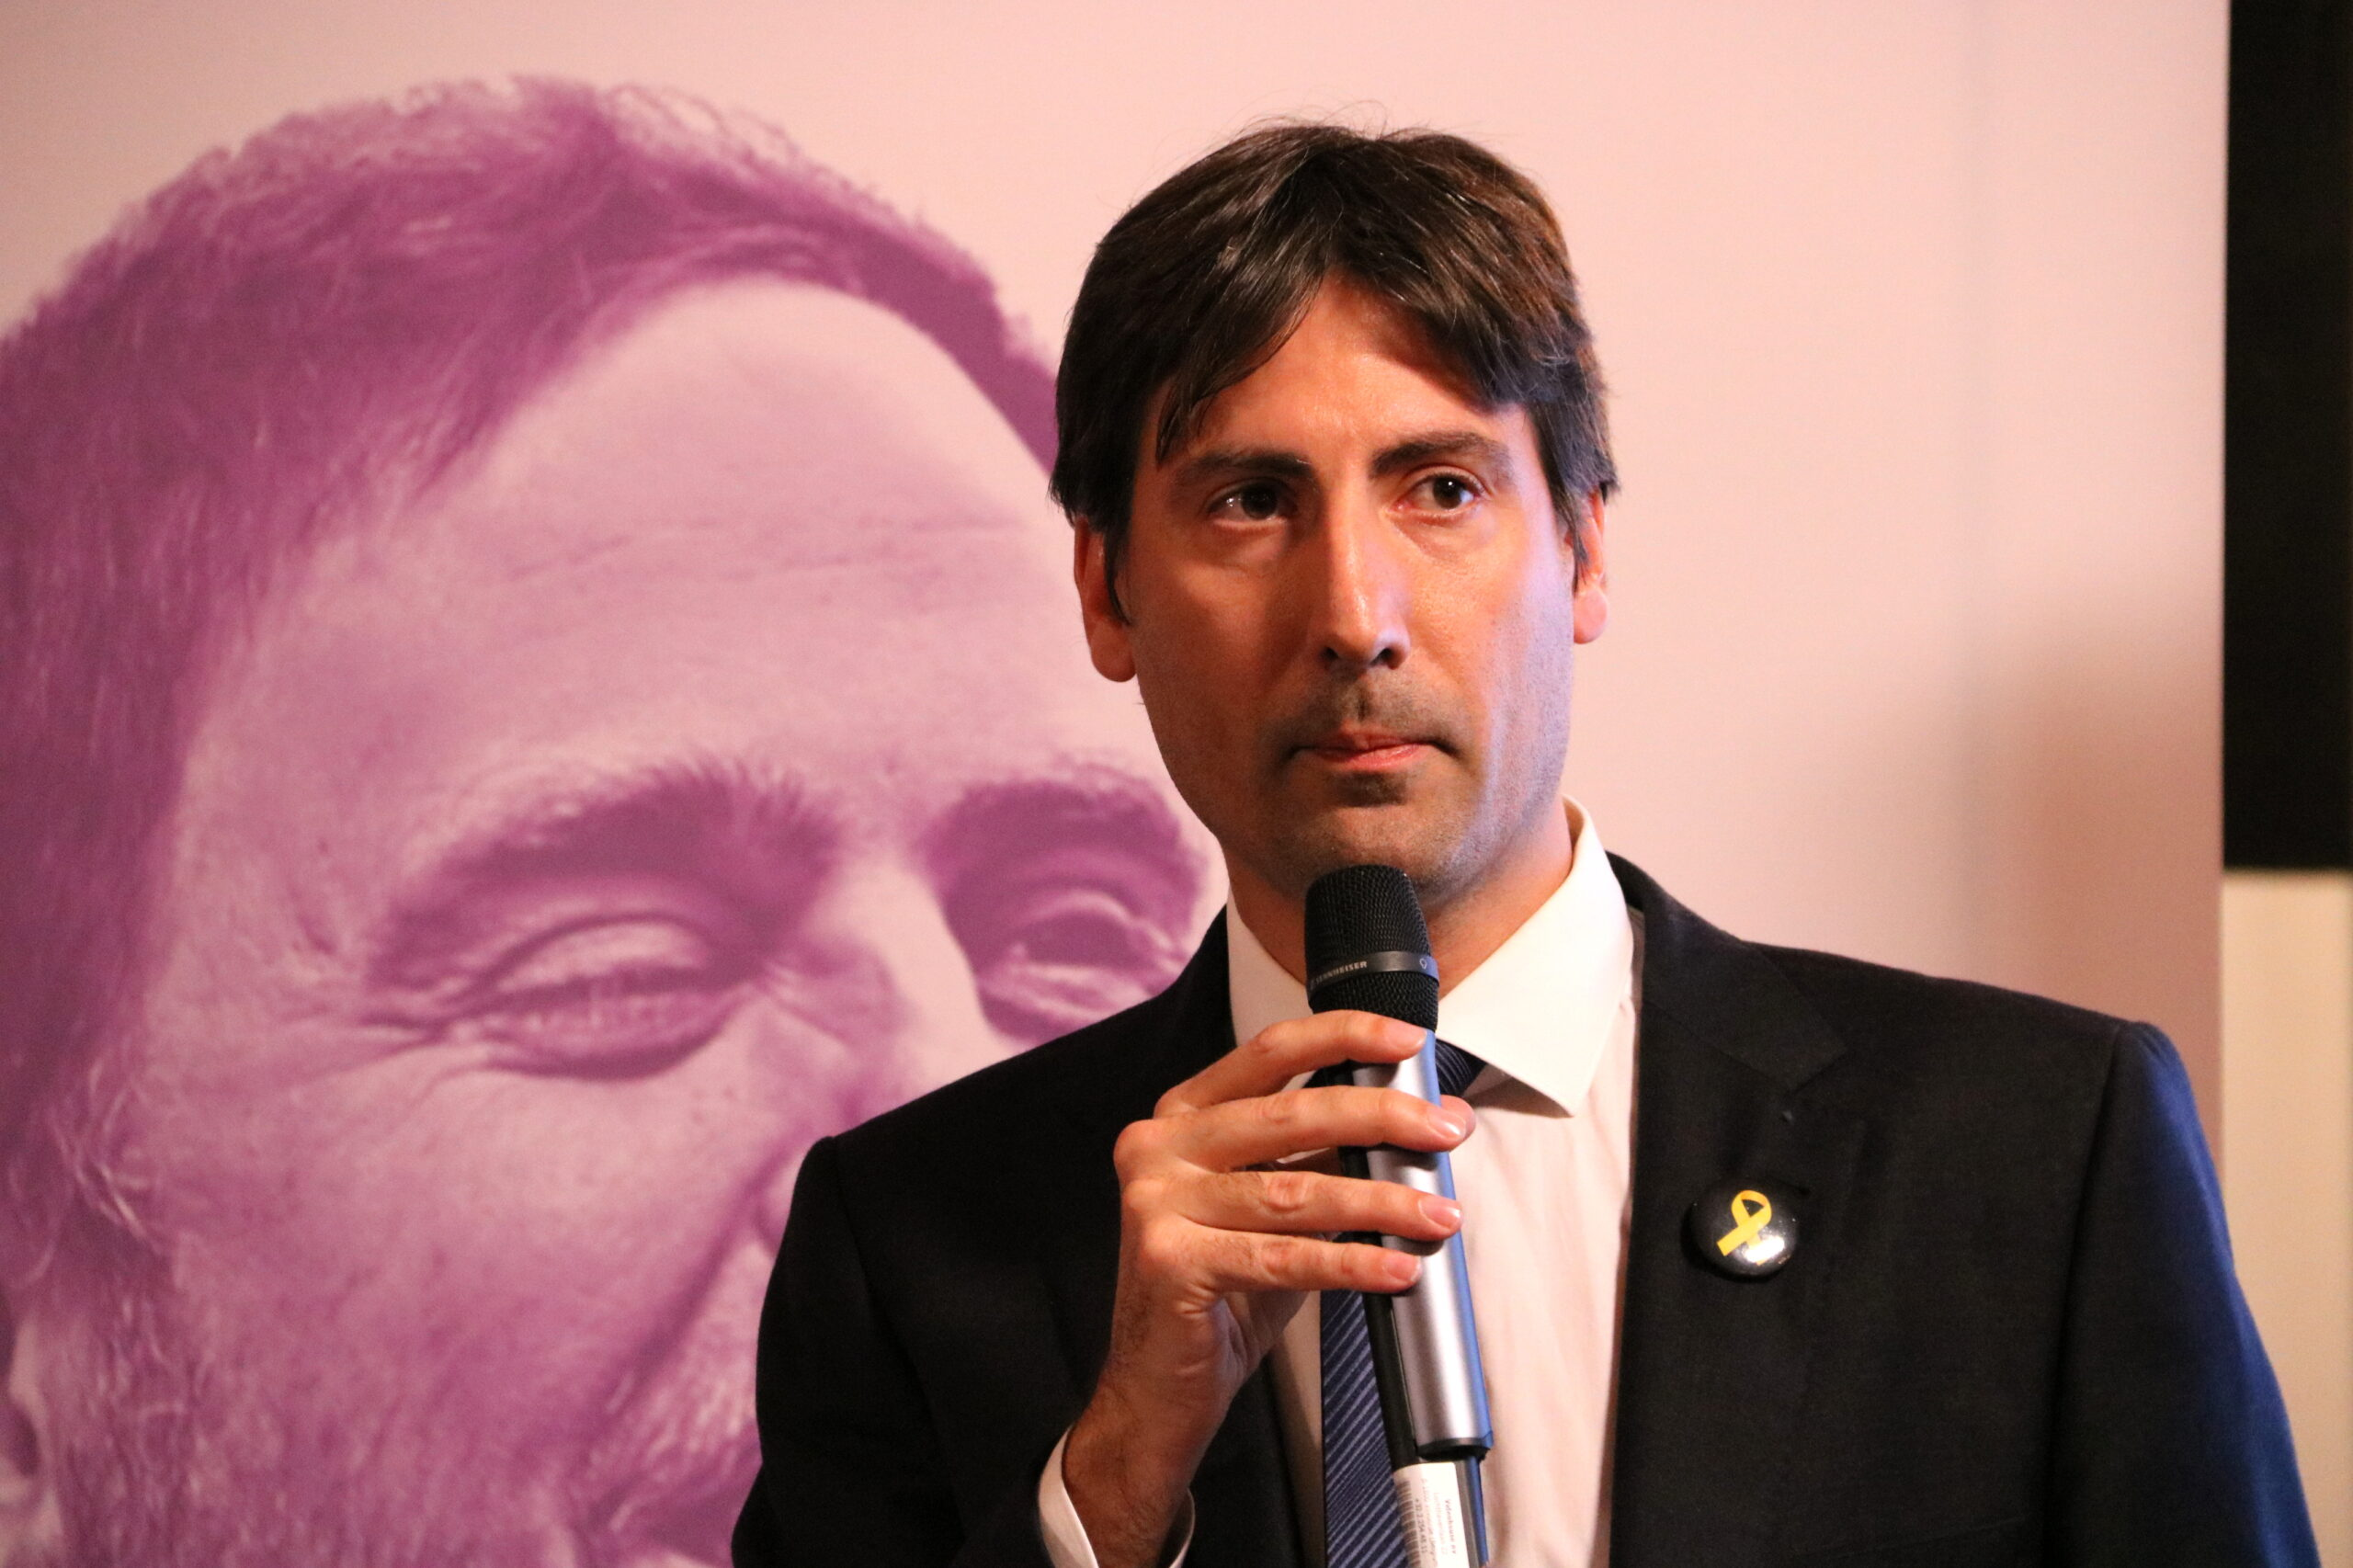 Jordi Solé